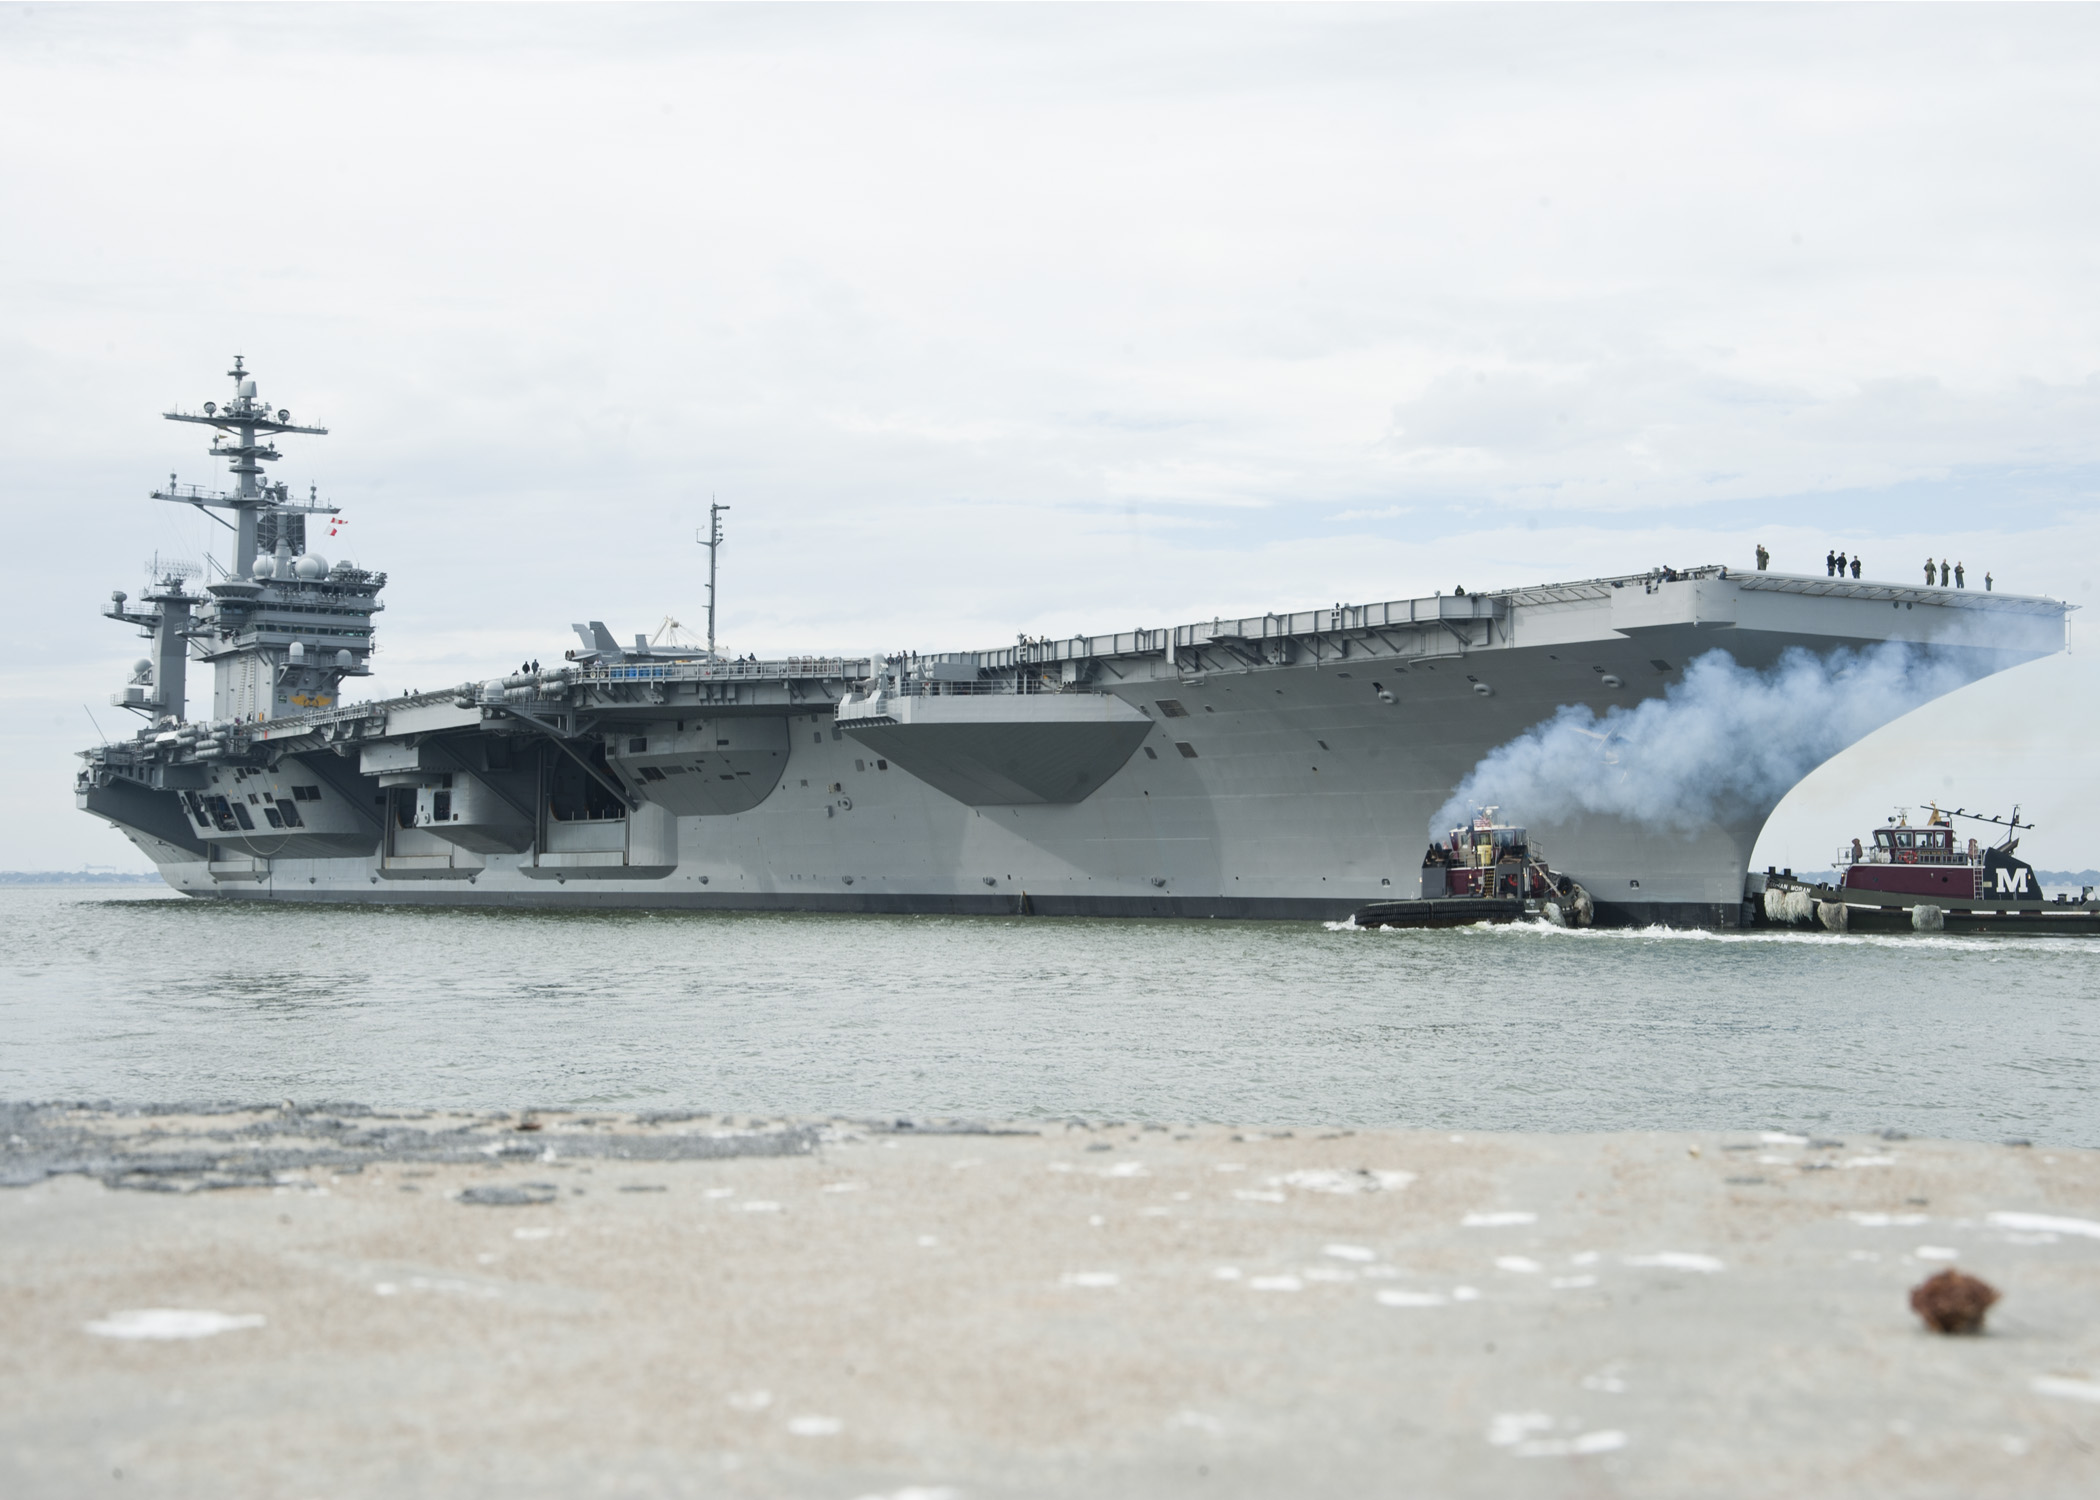 USS THEODORE ROOSEVELT CVN-71 22.10.2013Bild: U.S. Navy